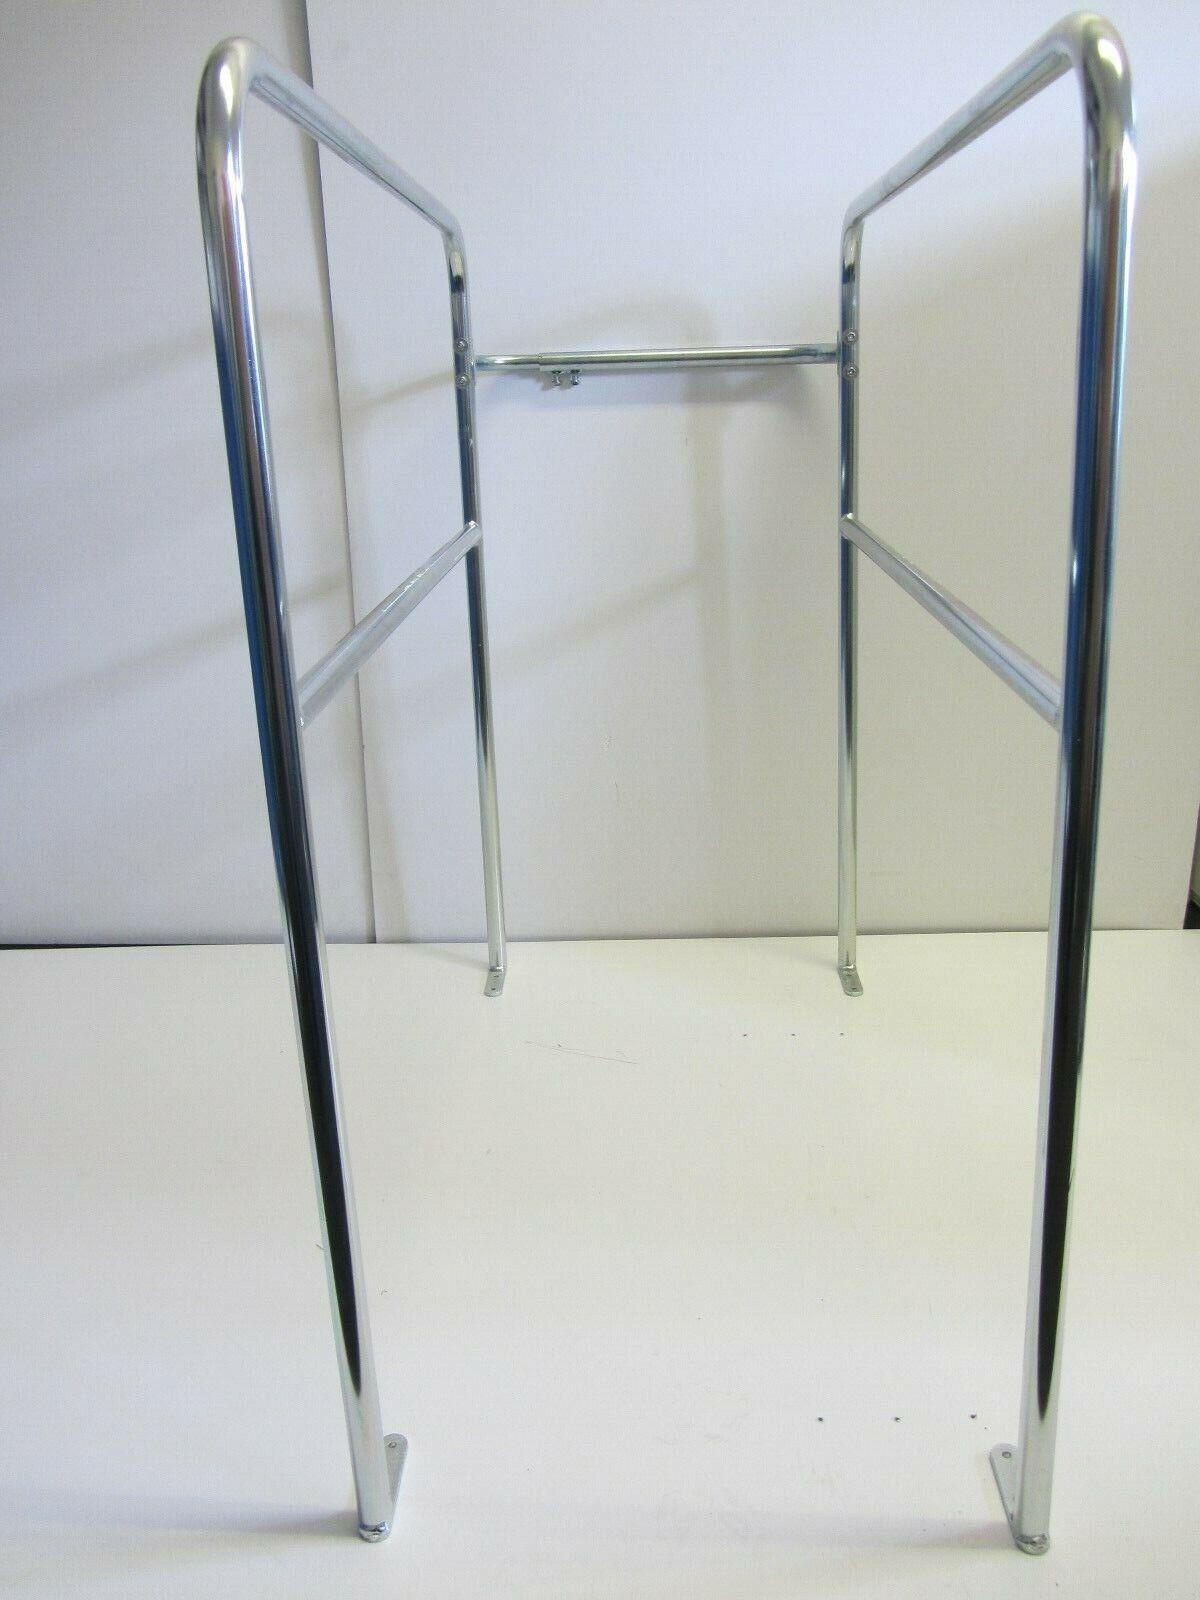 Loft Surround Rail Telescopic Steel Balustrade Safety Silver Rail by BWT